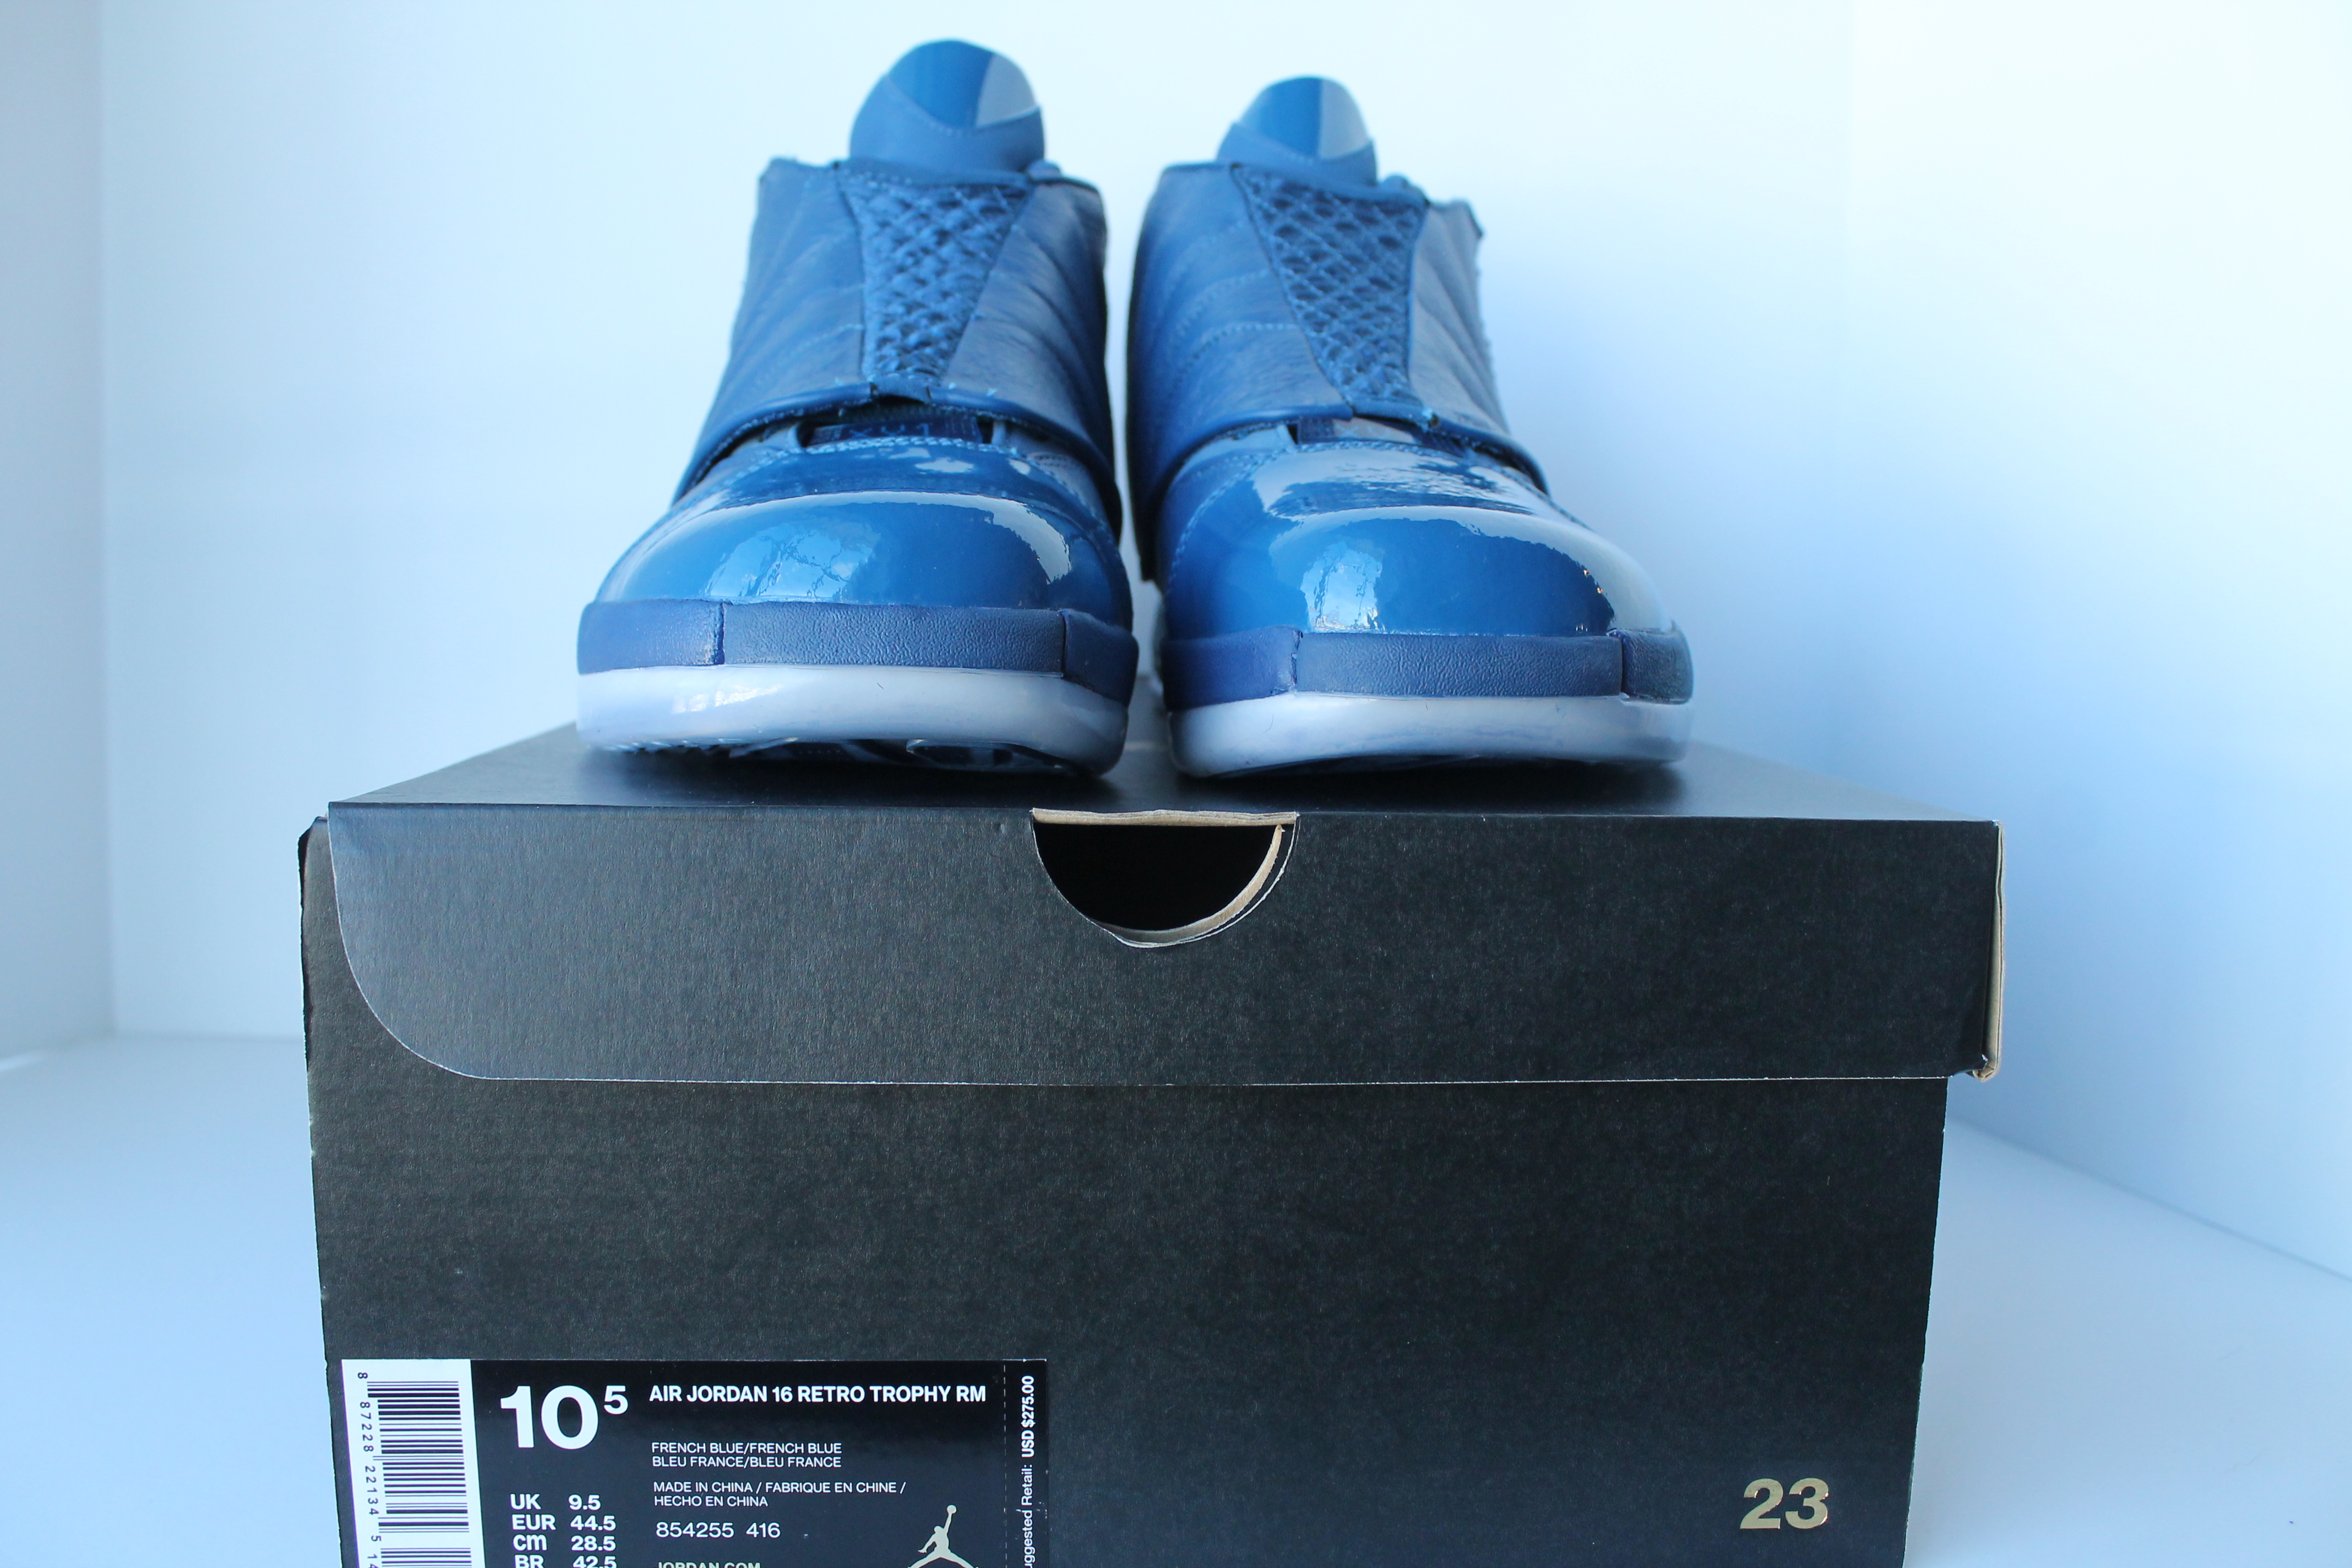 cdbedcceffd AuthentKicks | Air Jordan 16 Retro Trophy Room